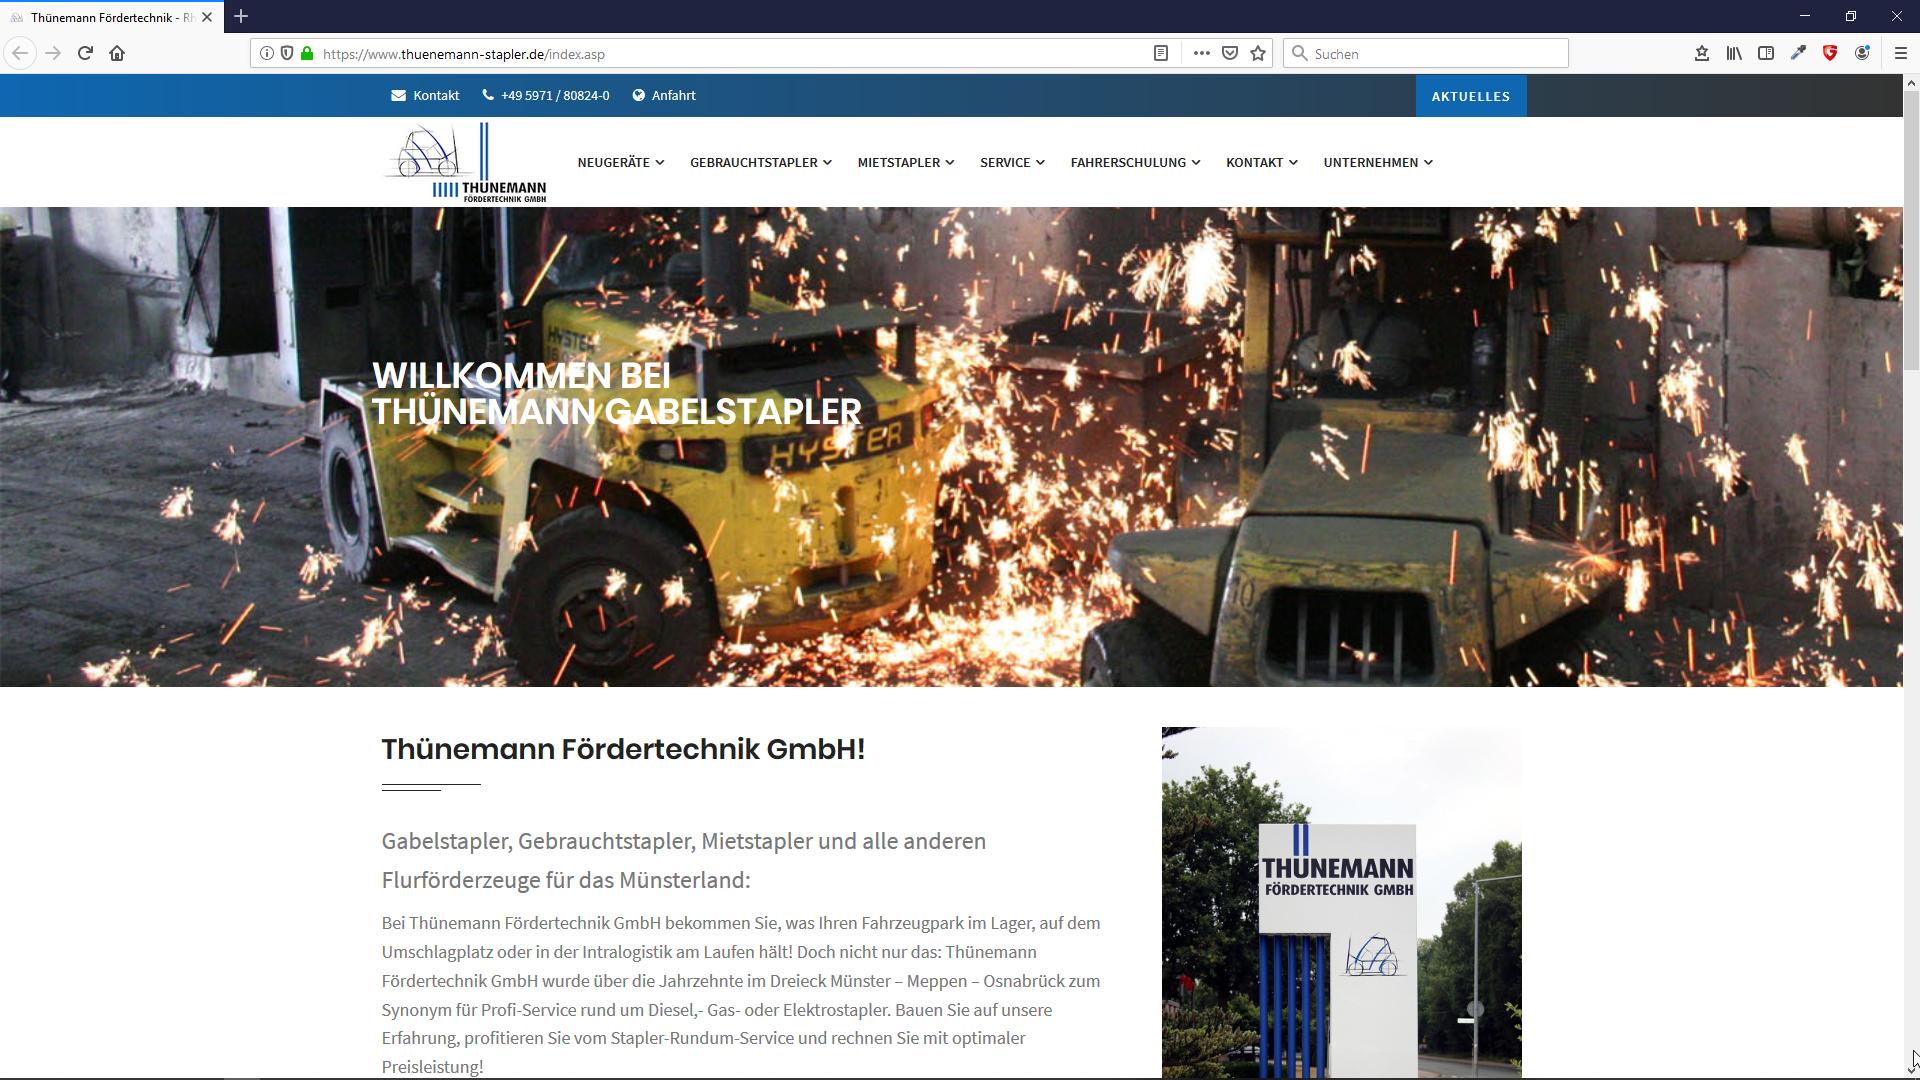 Thünemann Fördertechnik GmbH